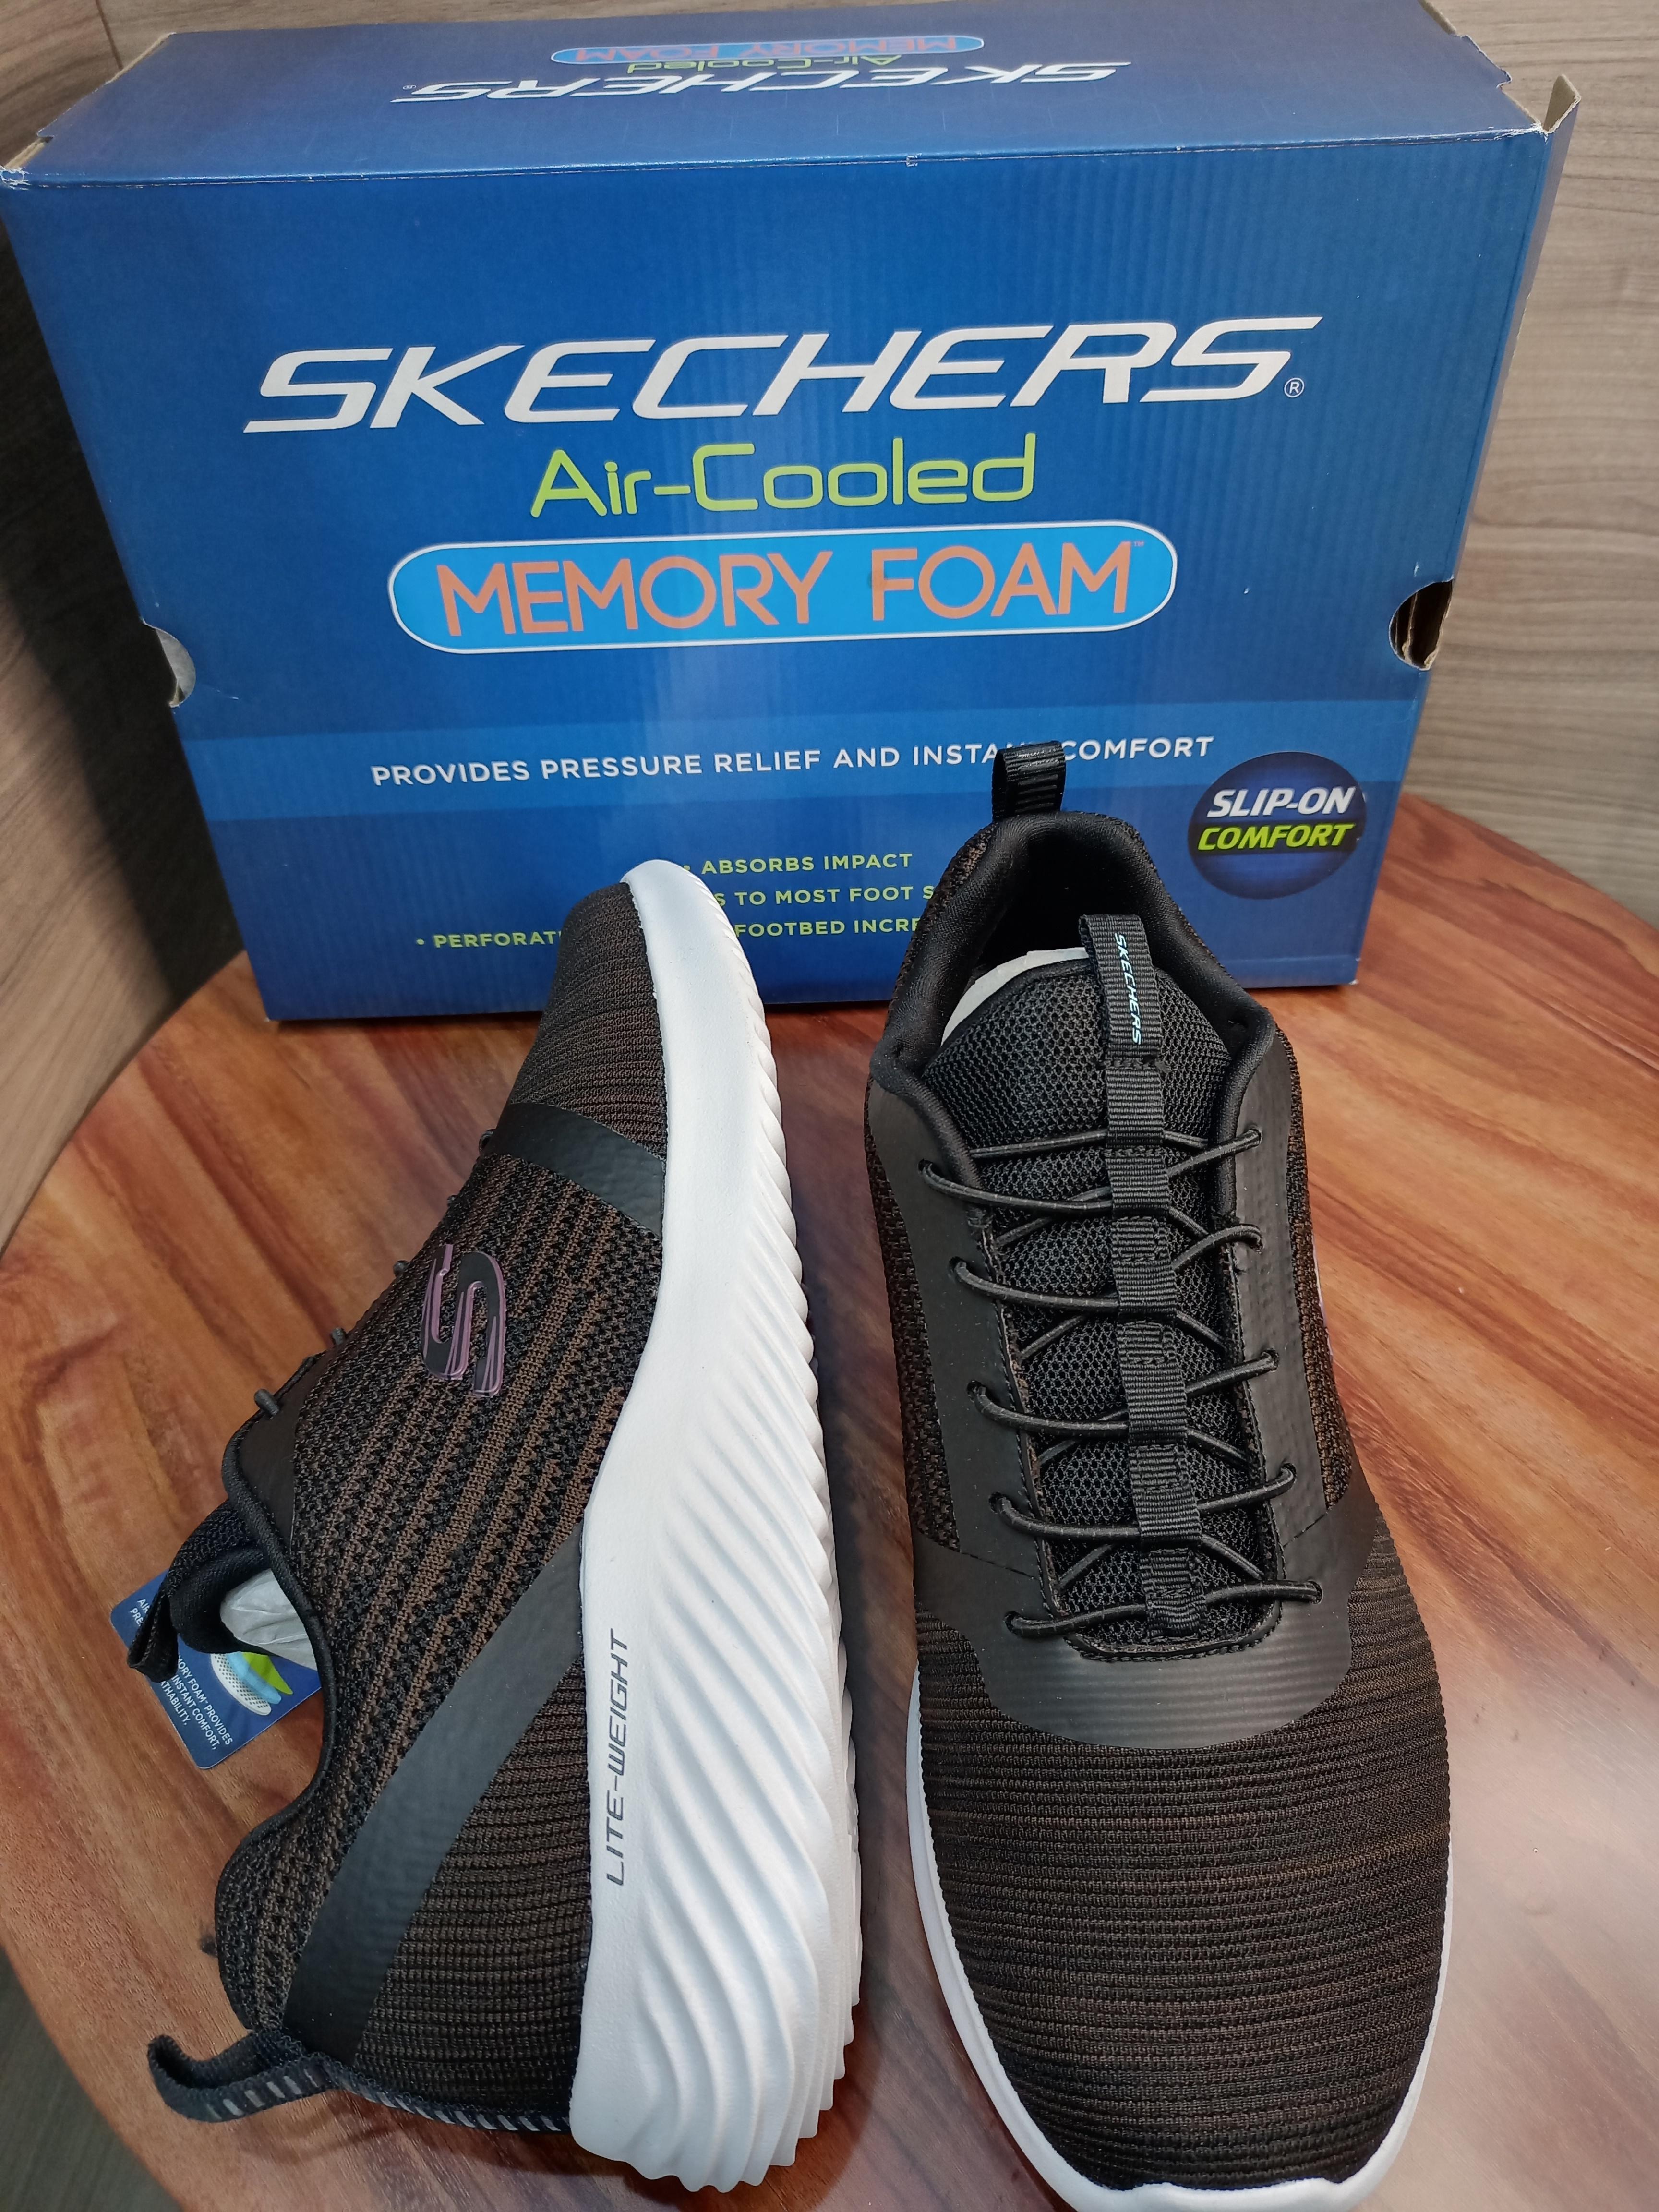 52504 skechers shoes